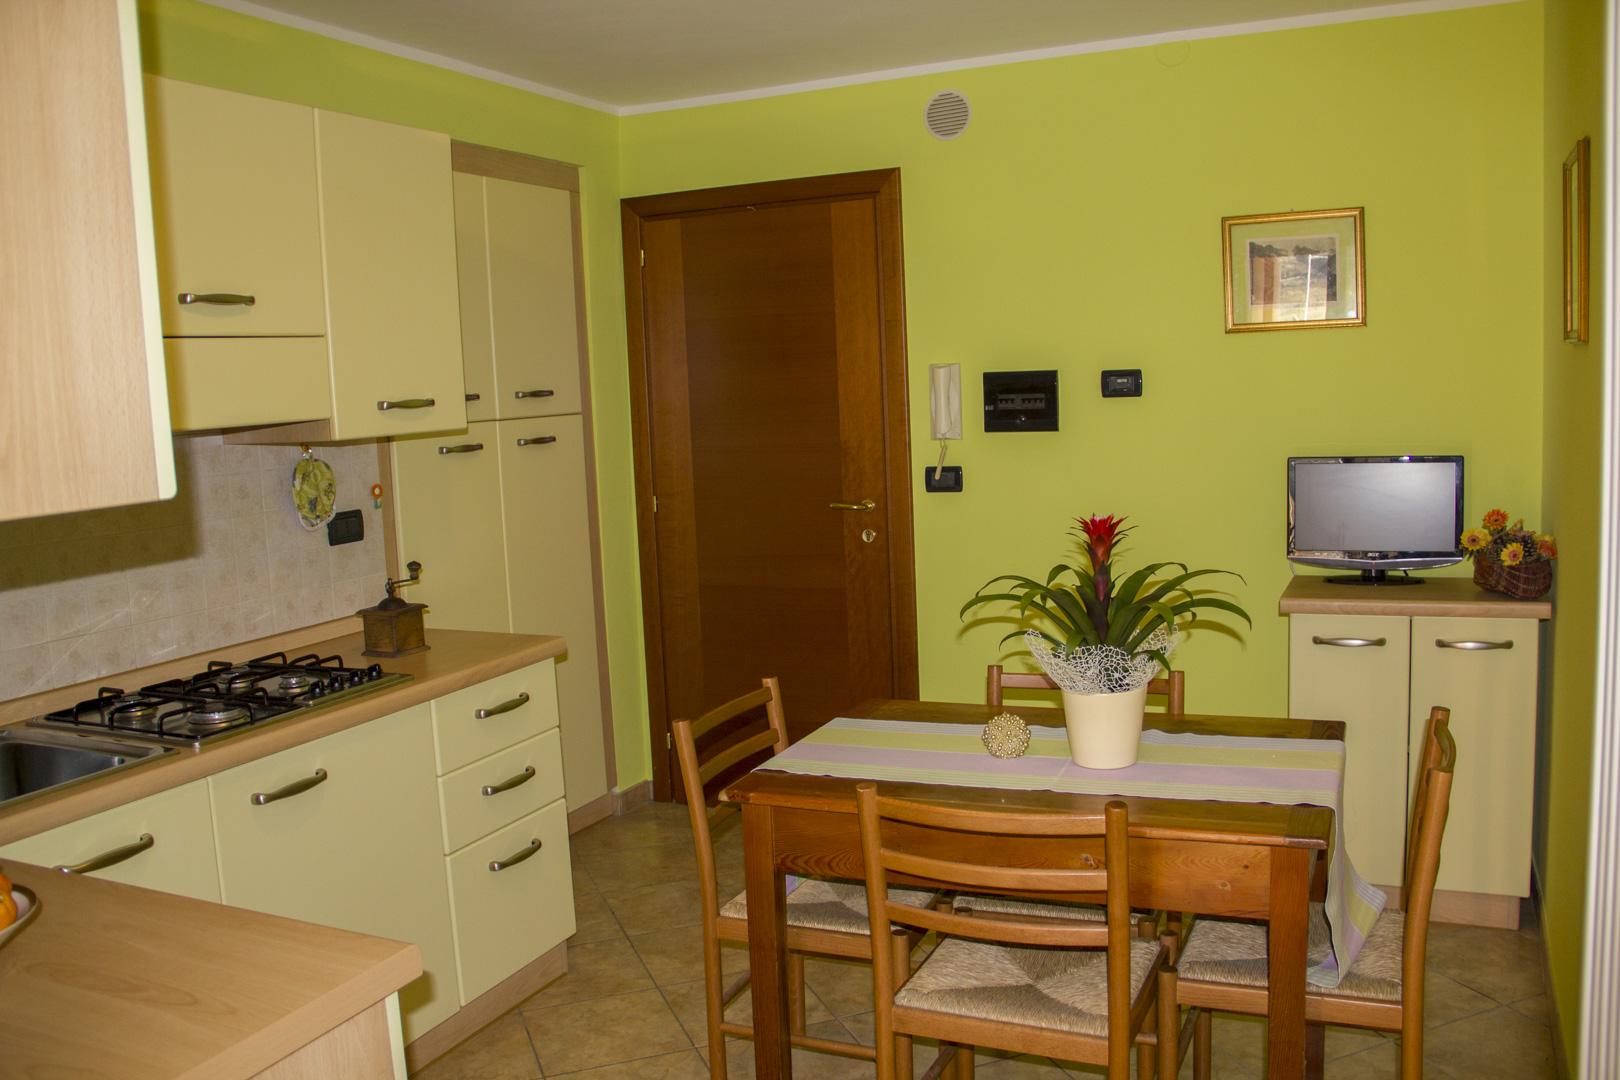 bilocale-ingresso-cucina-living-ca-del-nore-fontainemore